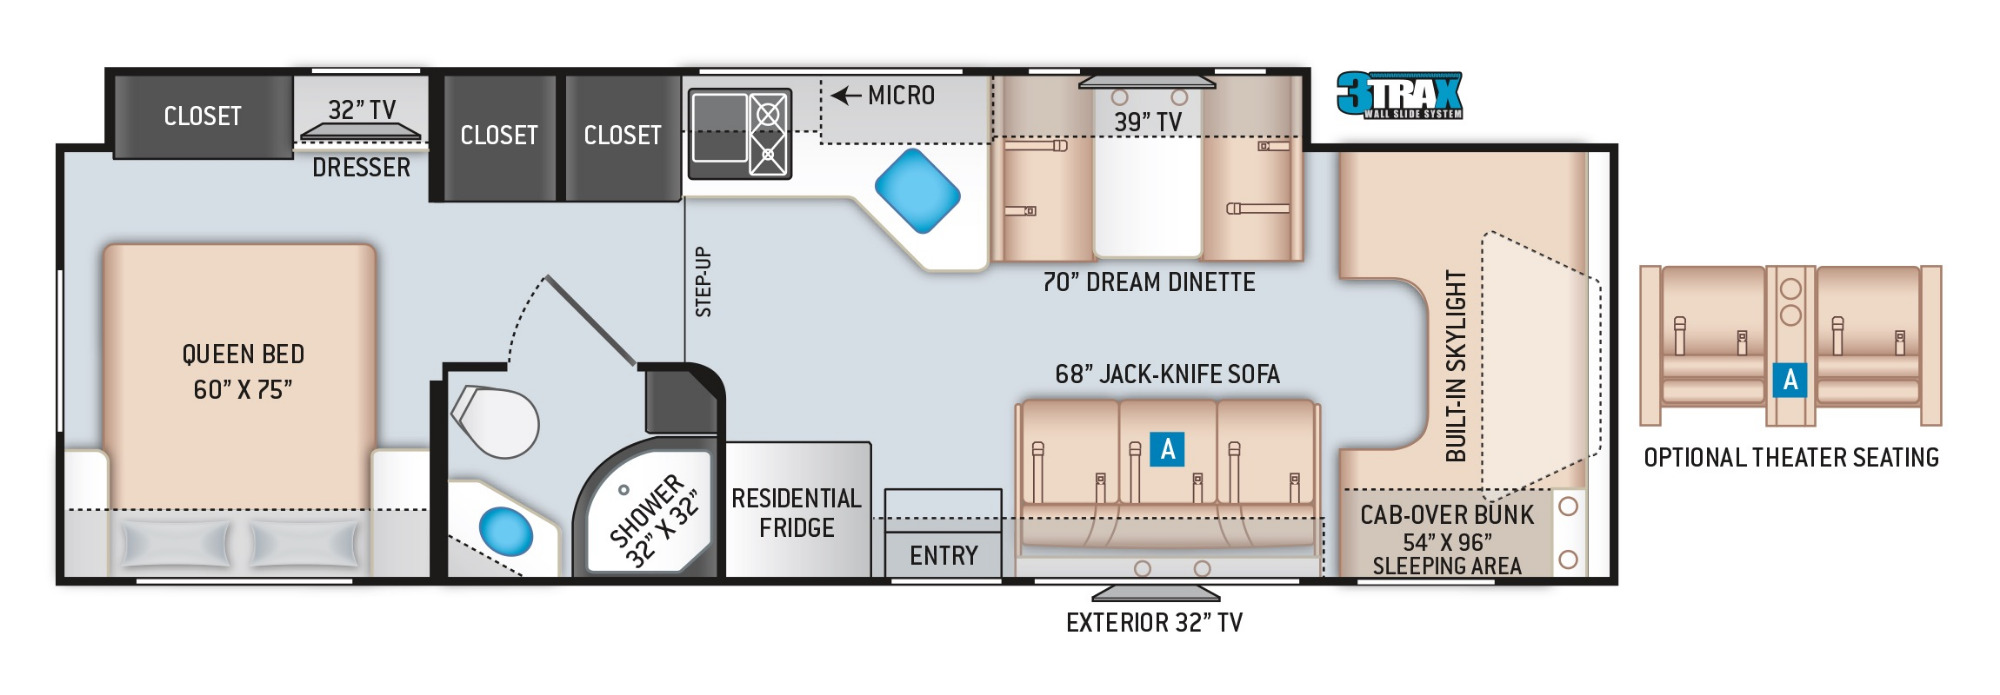 View Floor Plan for 2021 THOR QUANTUM WS31